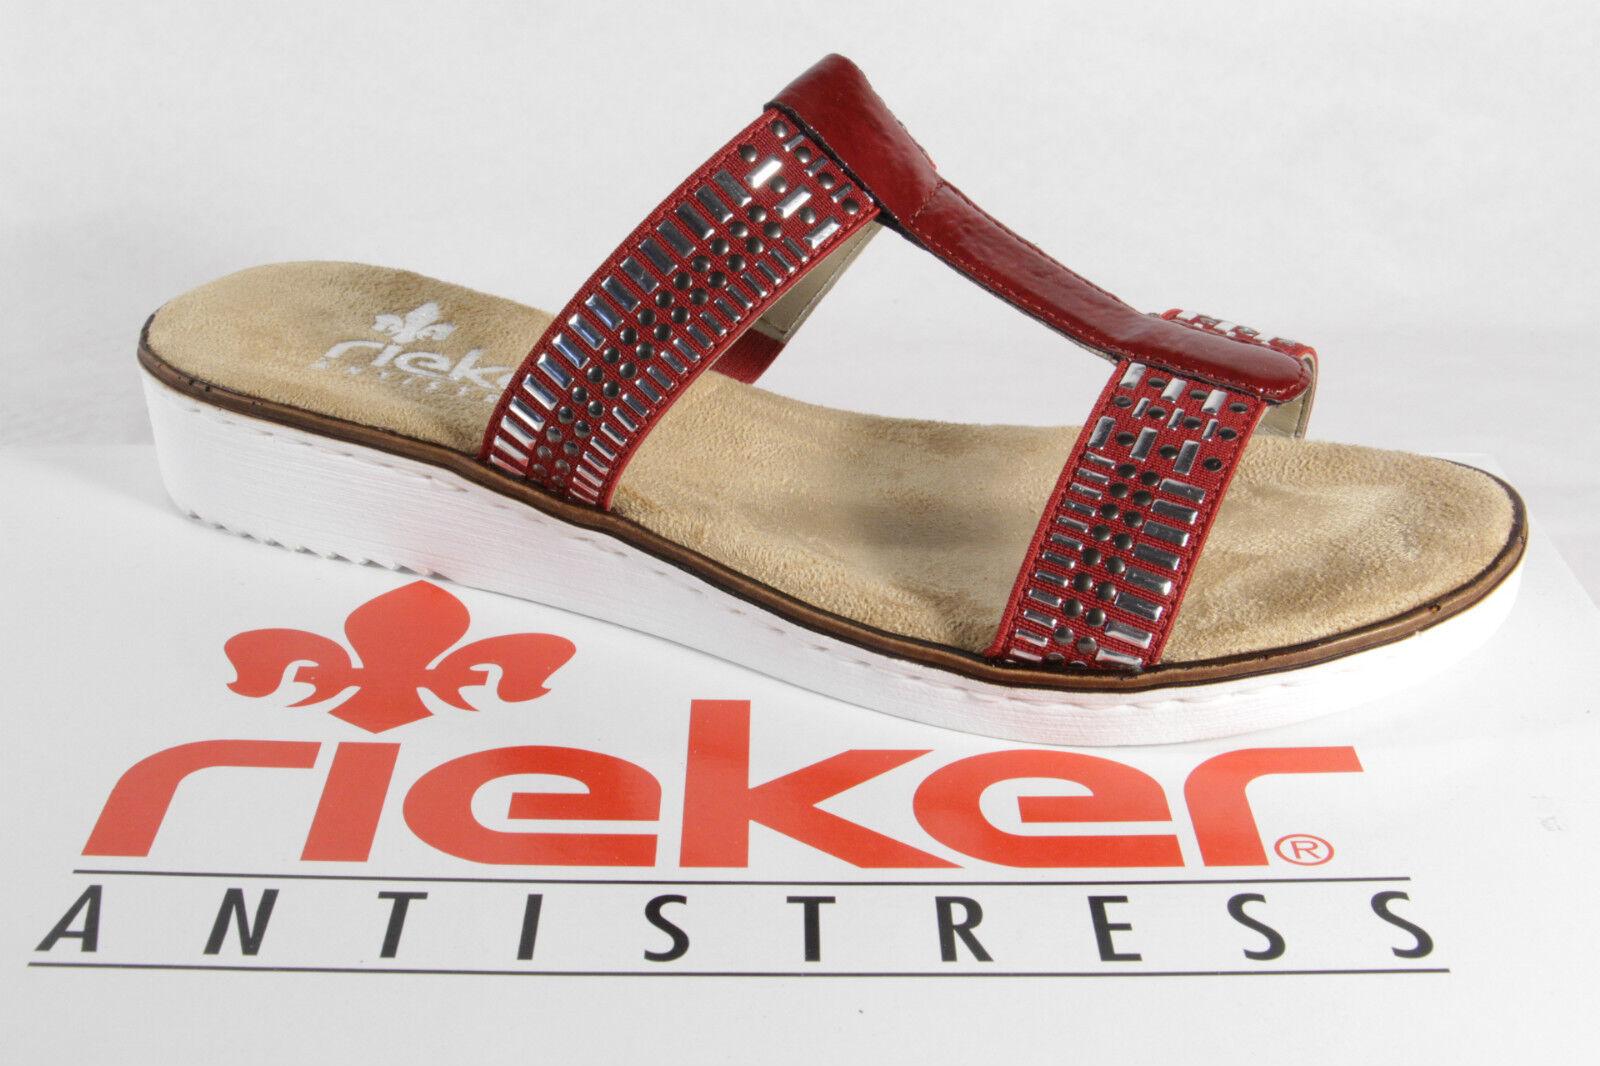 Rieker donna pantofole sandali rosso/Silver NUOVO